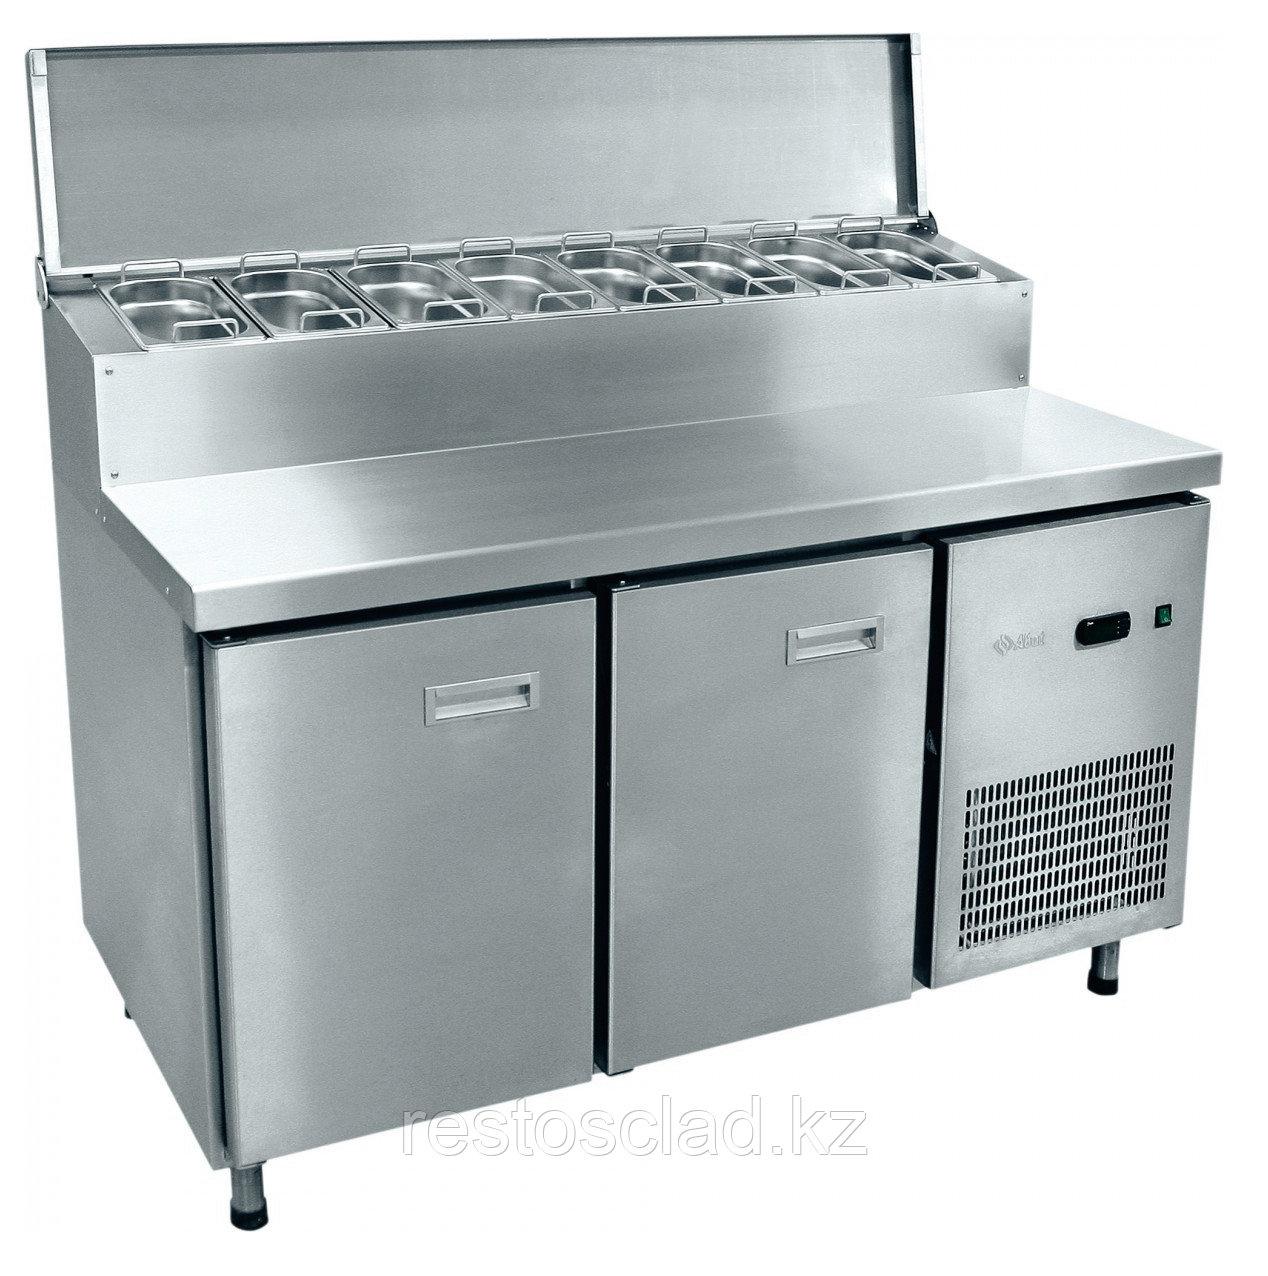 Стол охлаждаемый для пиццы СХС-70-01П